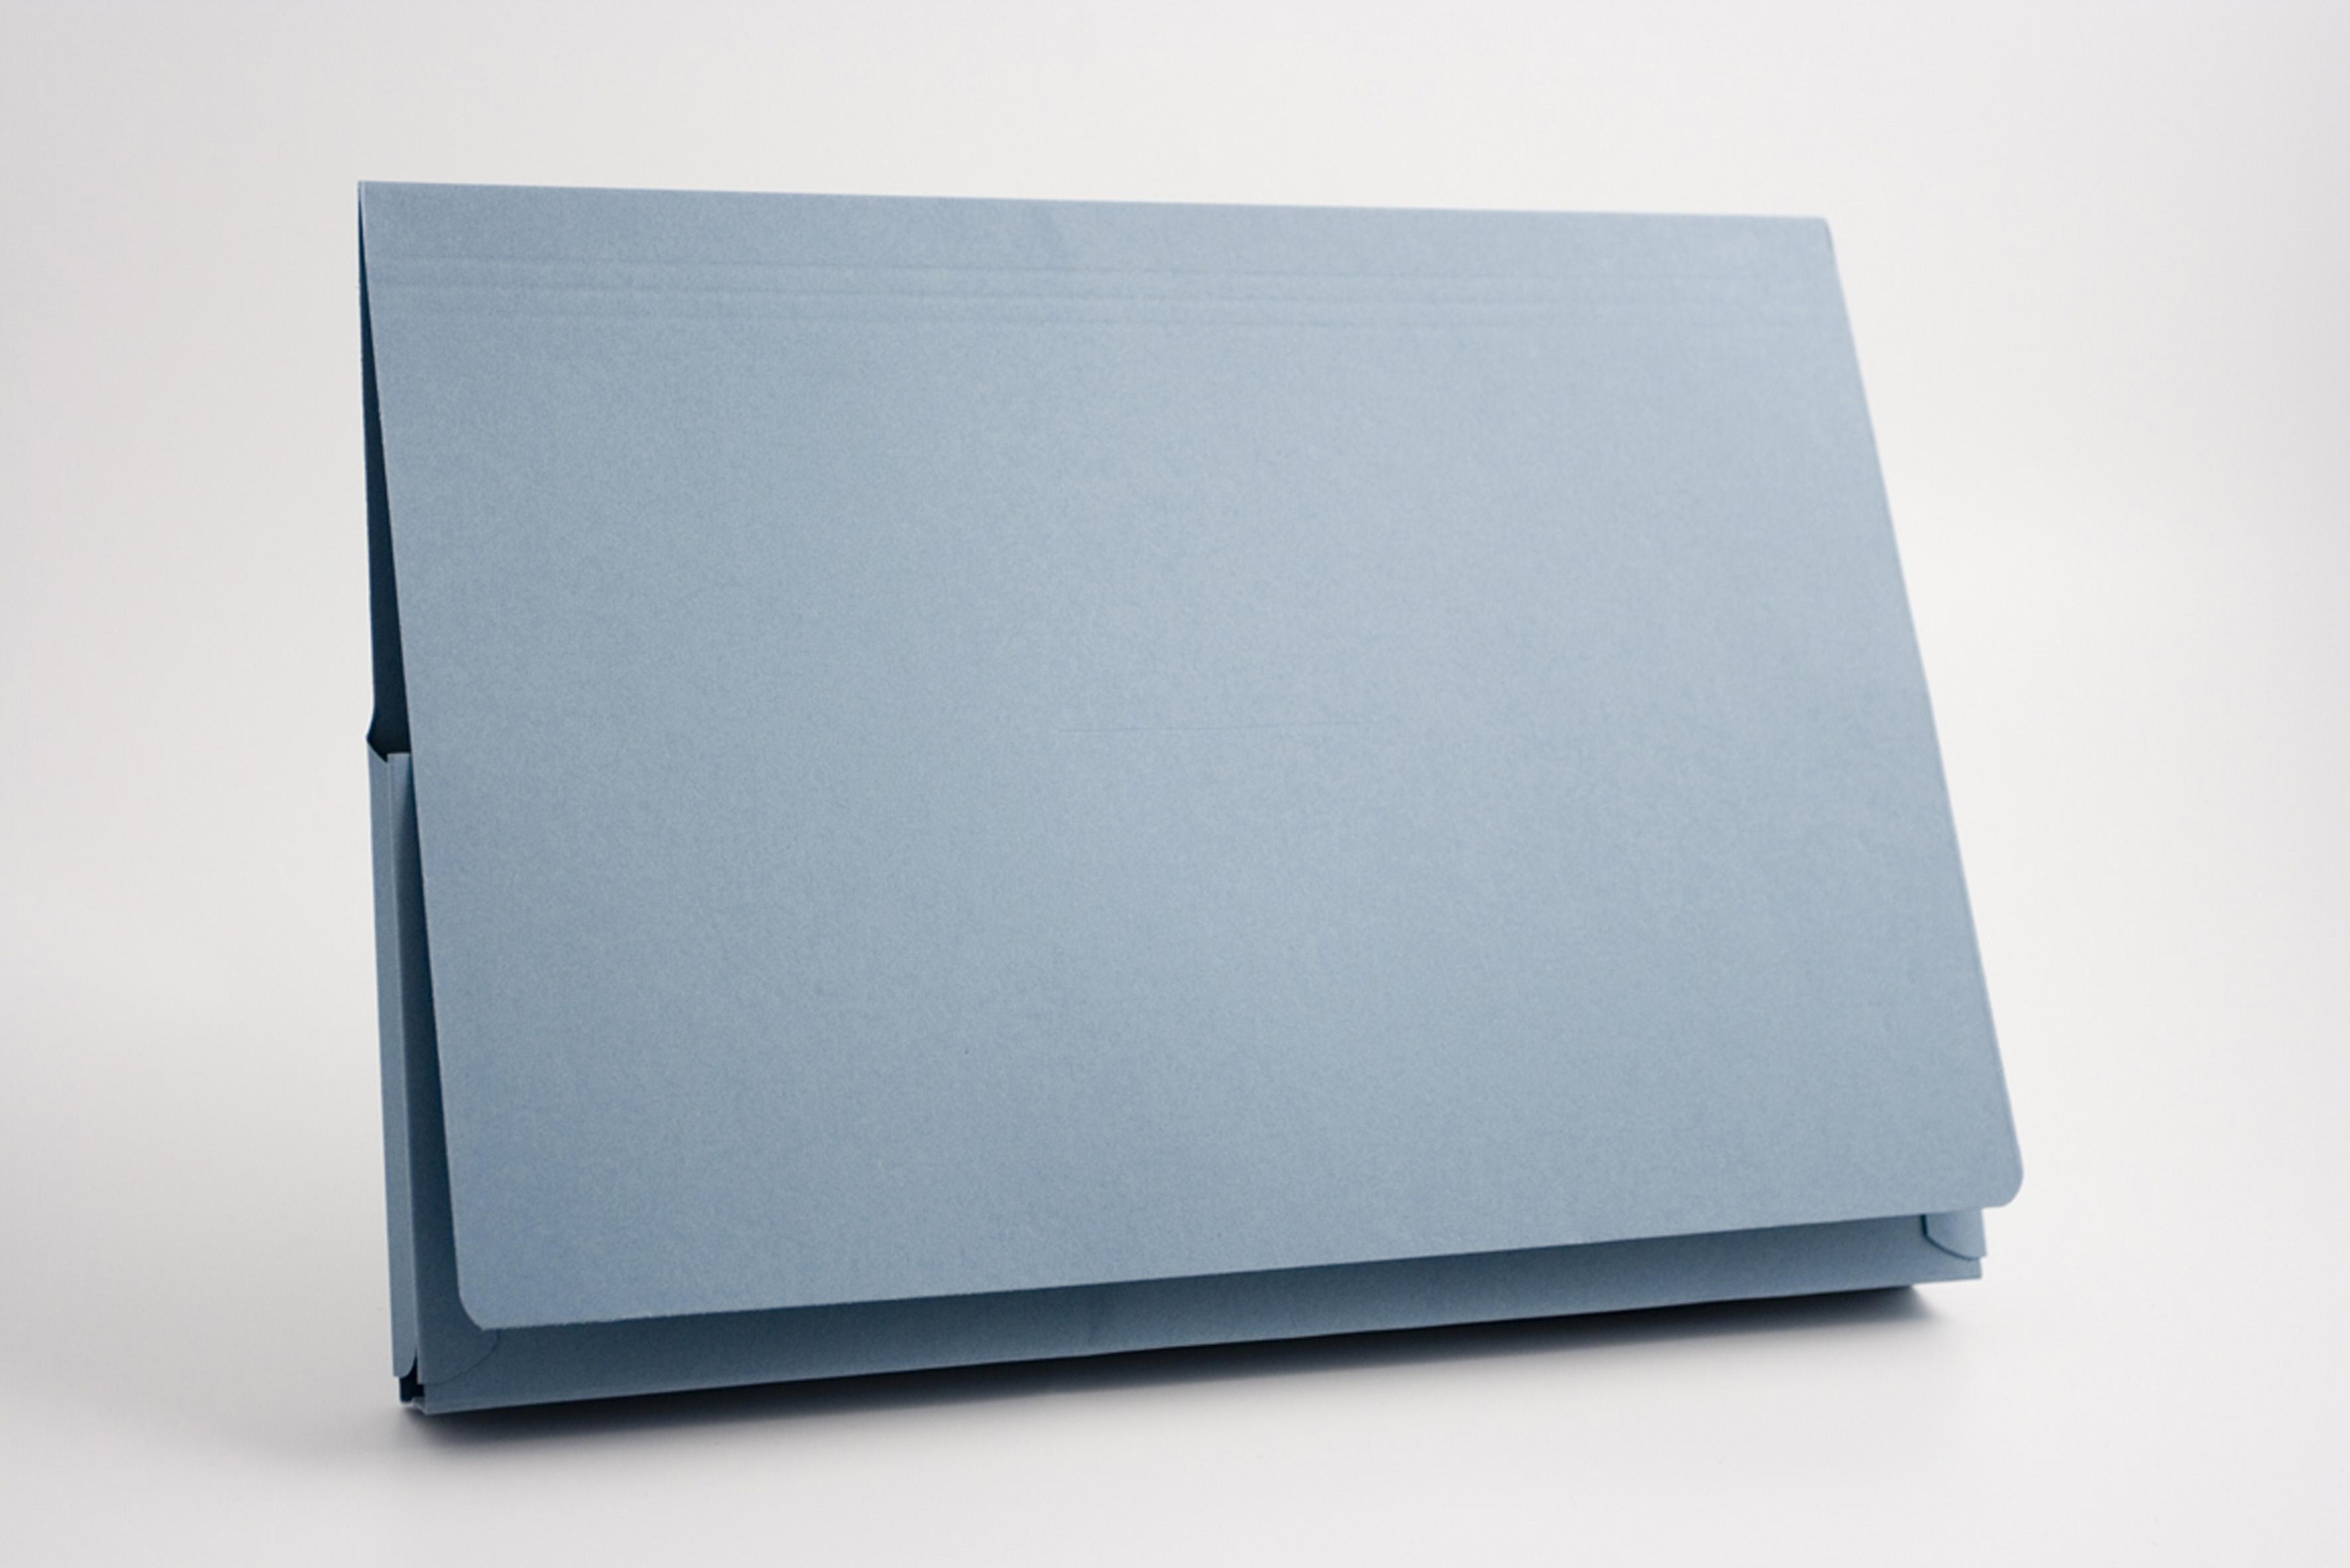 Ghall SHW 14x10 Flap Wallet Blue PK25